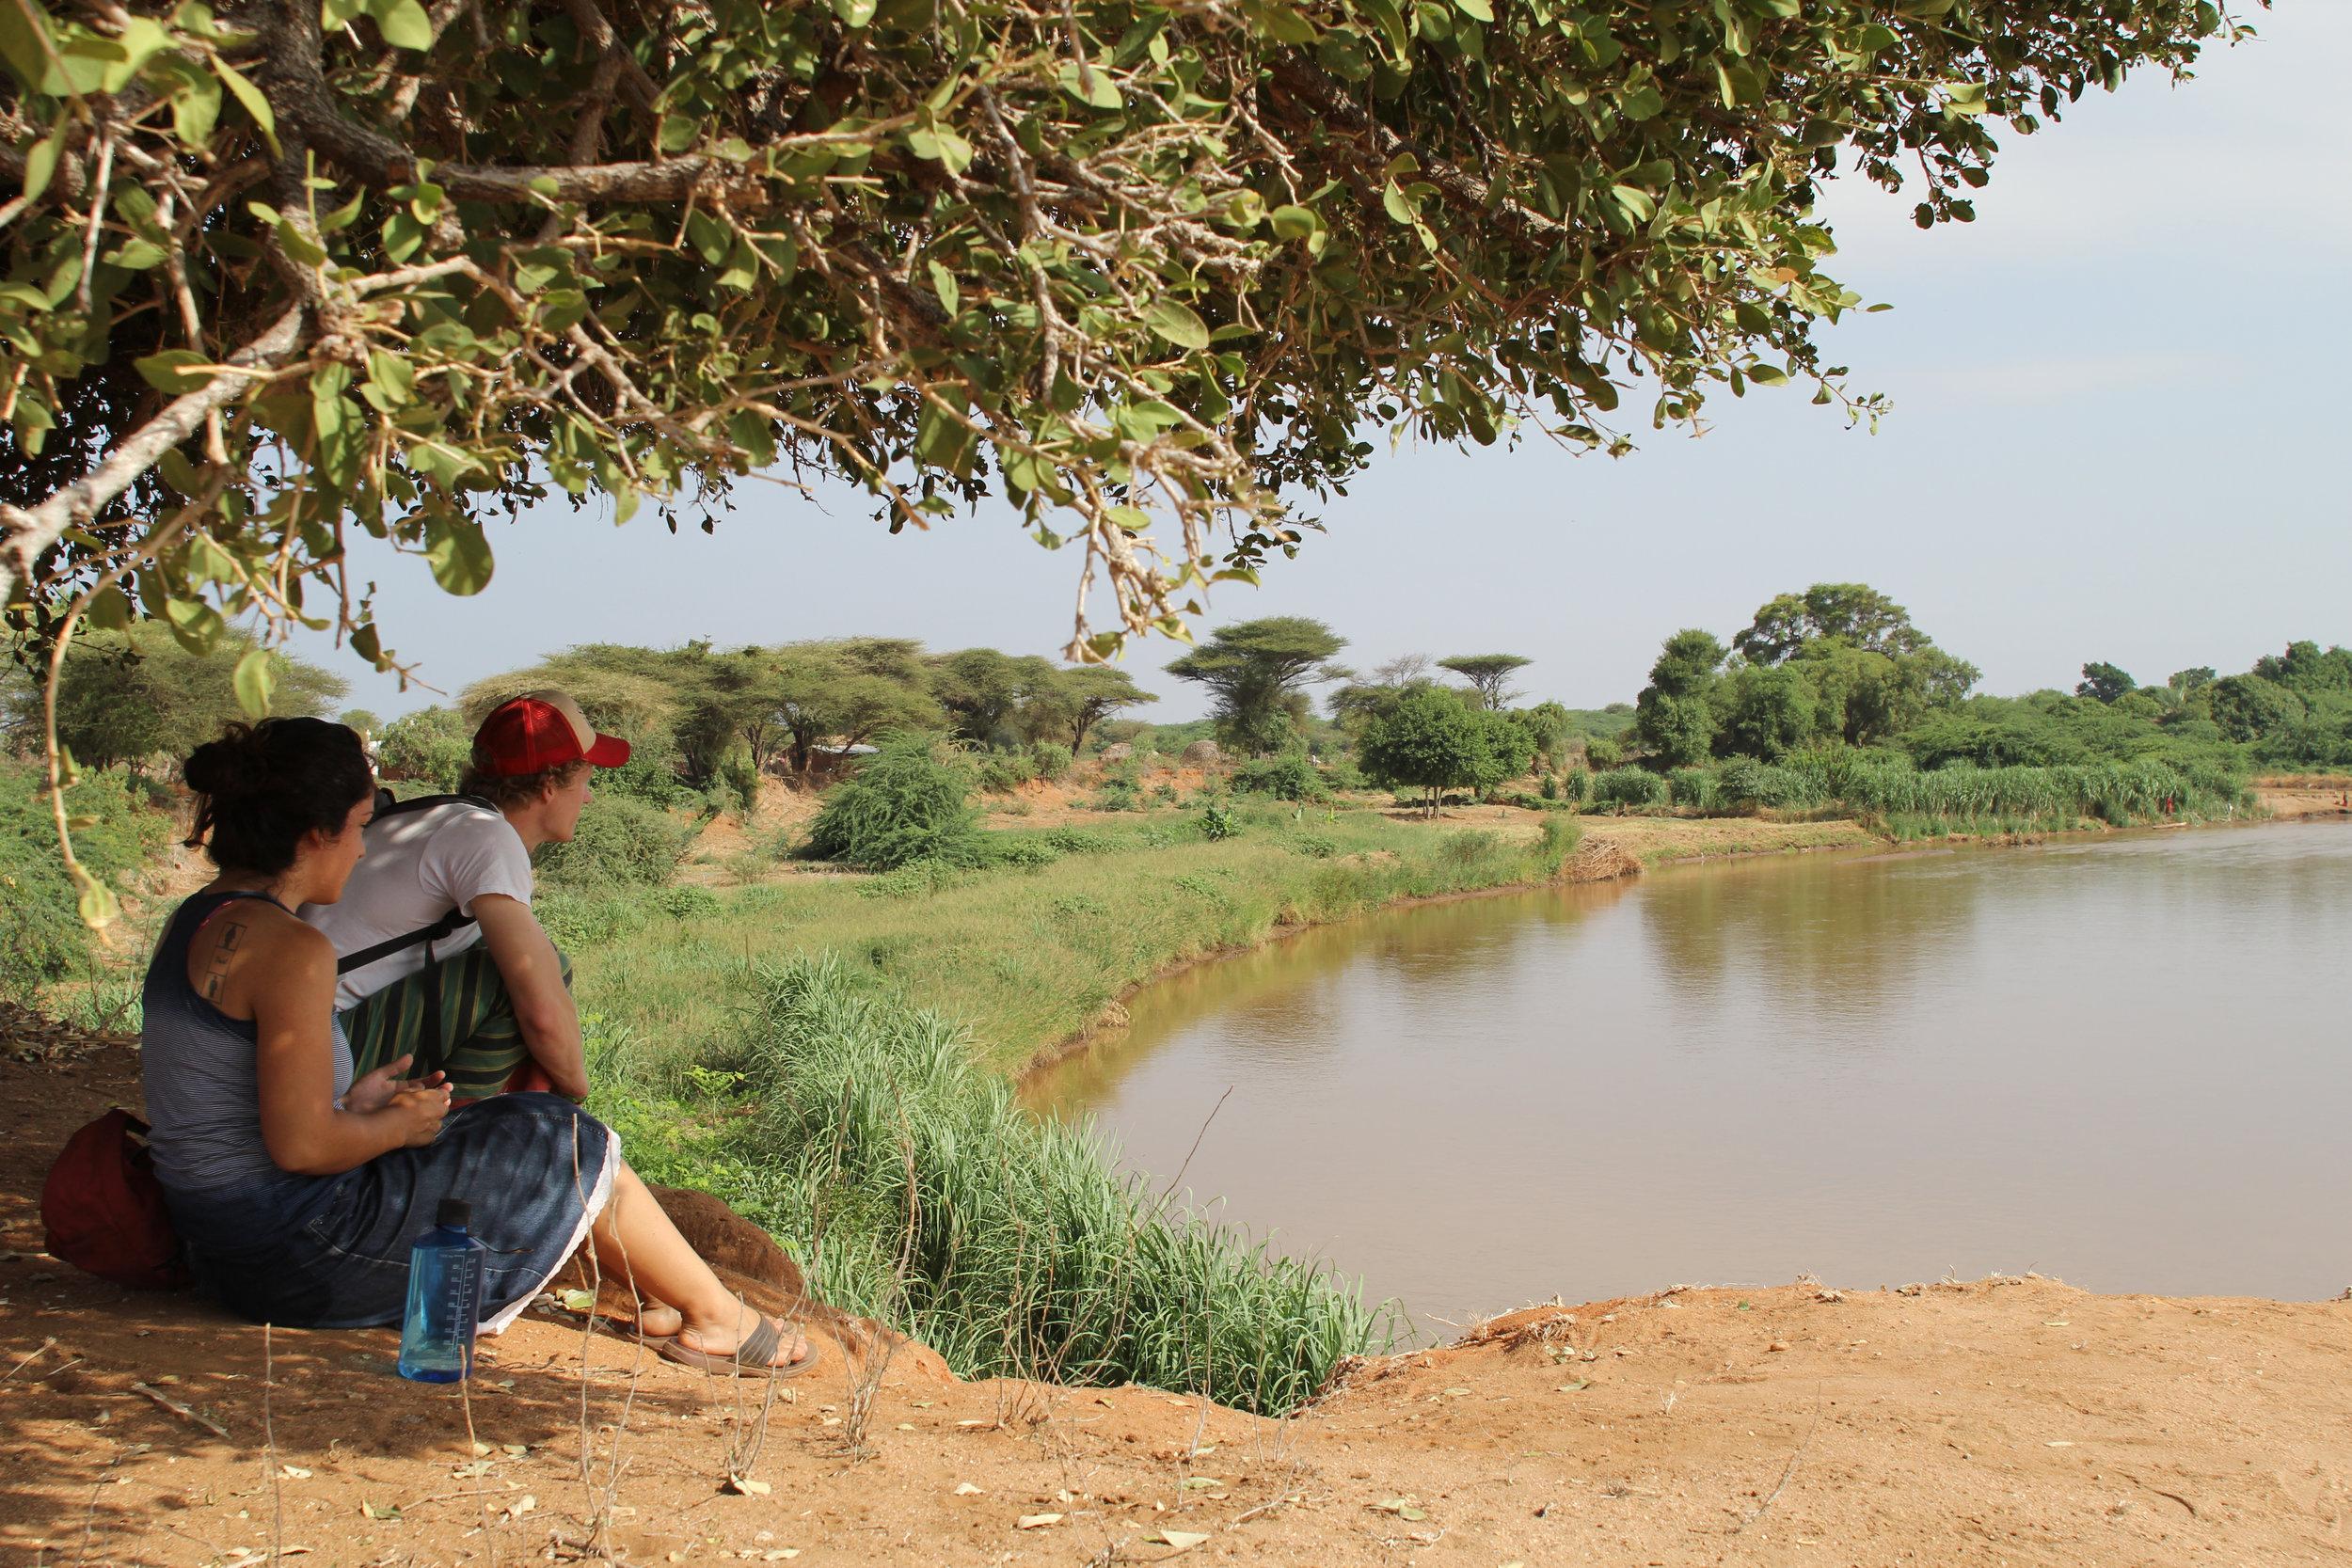 Garissa, Kenya